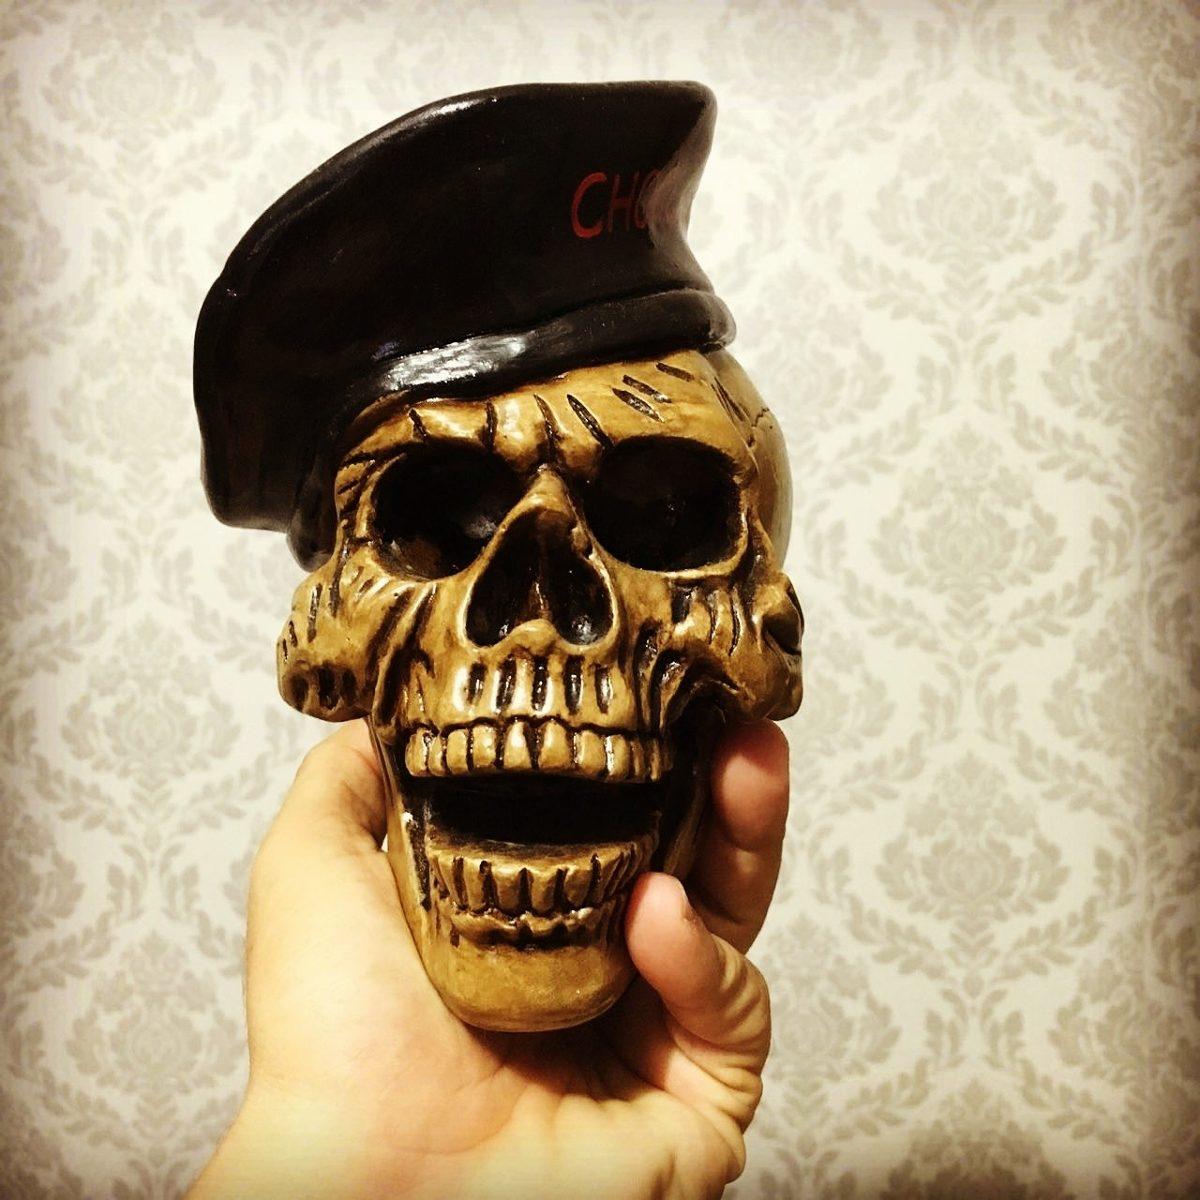 a90a8813b5499 Caveira Militar - Caveira Boina - Skull - Frete Gratis